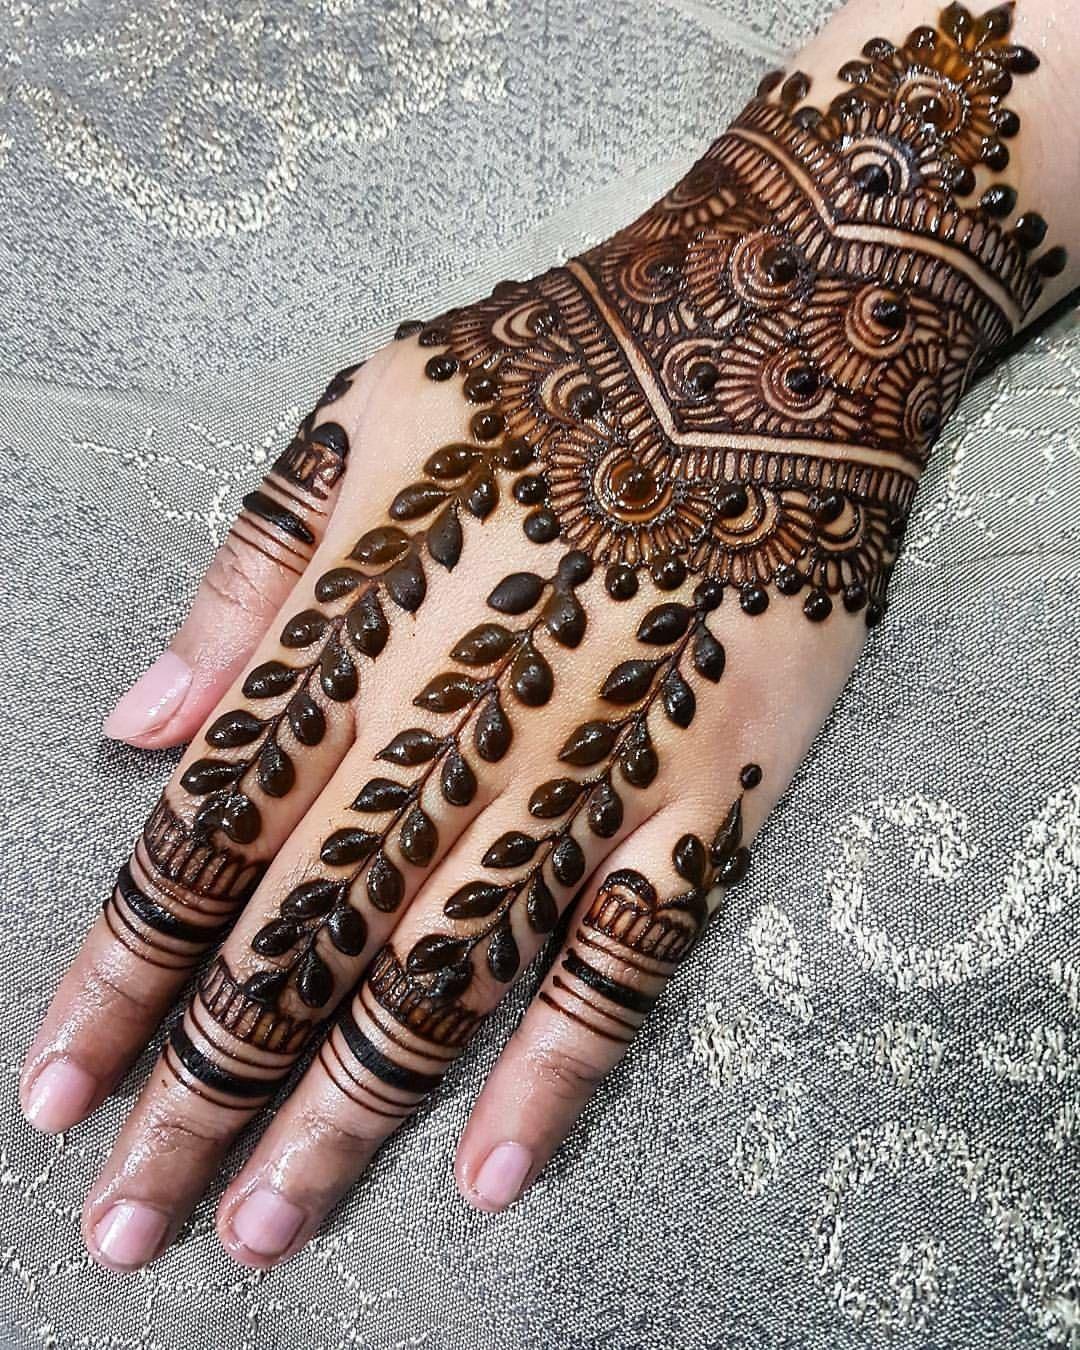 Pin by Priya Maheshwari on latest mehendi design Pinterest Henna